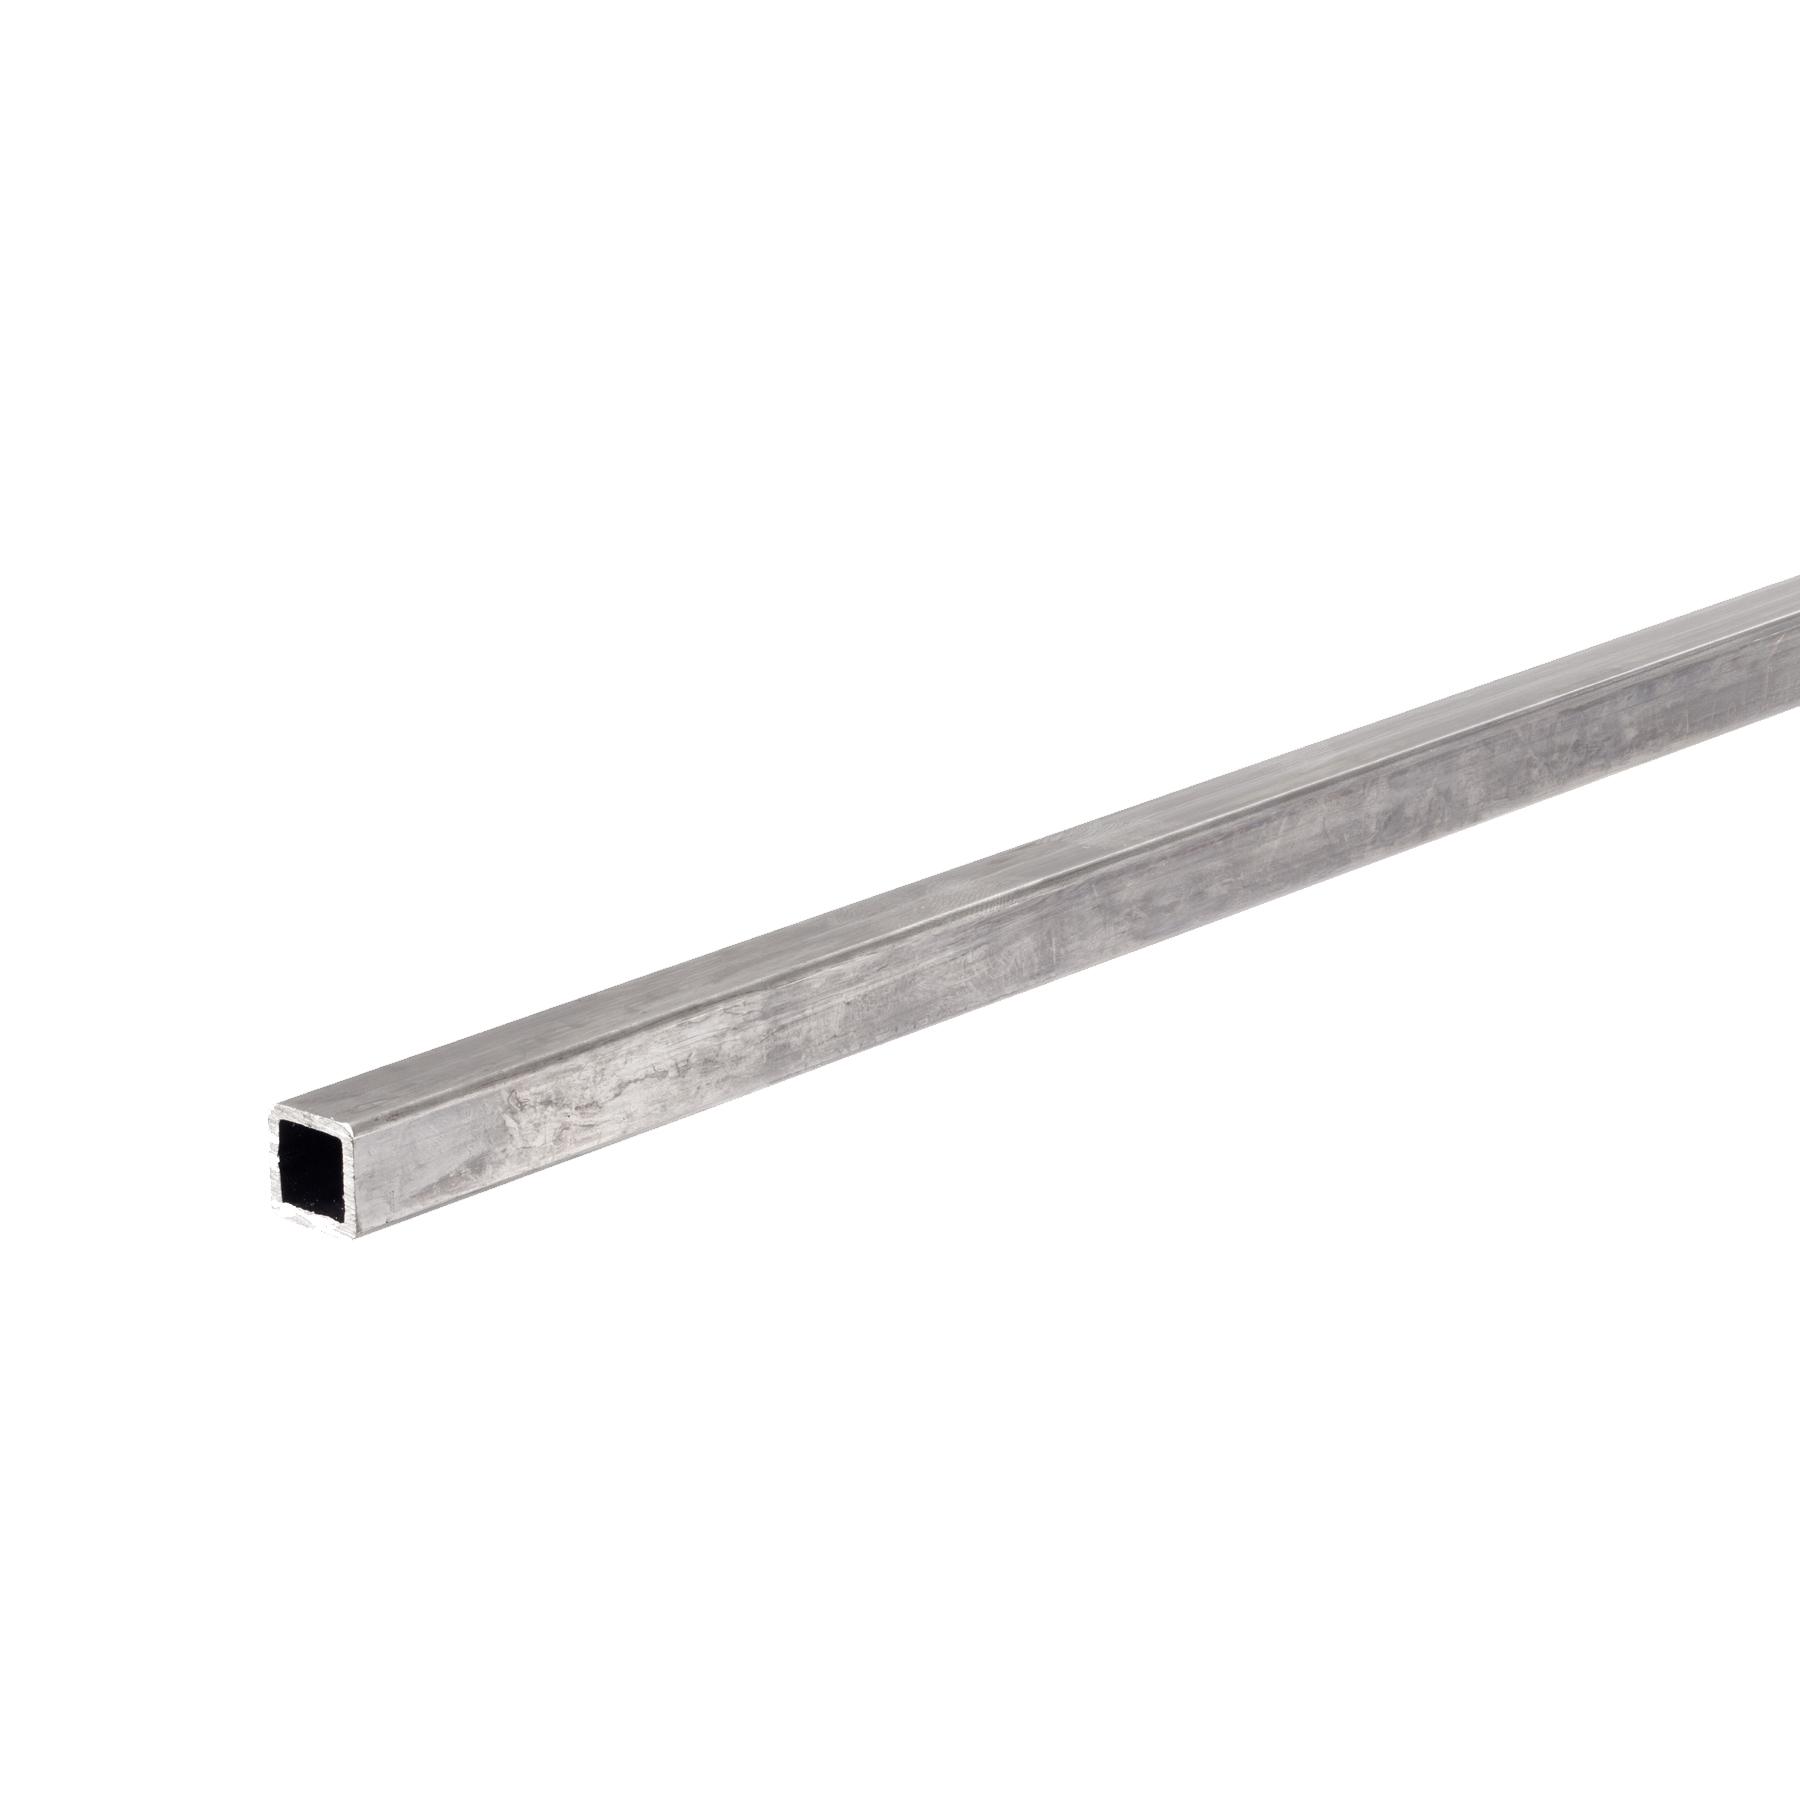 Perfil Tubo Quadrado Aço 1mx1,5cm